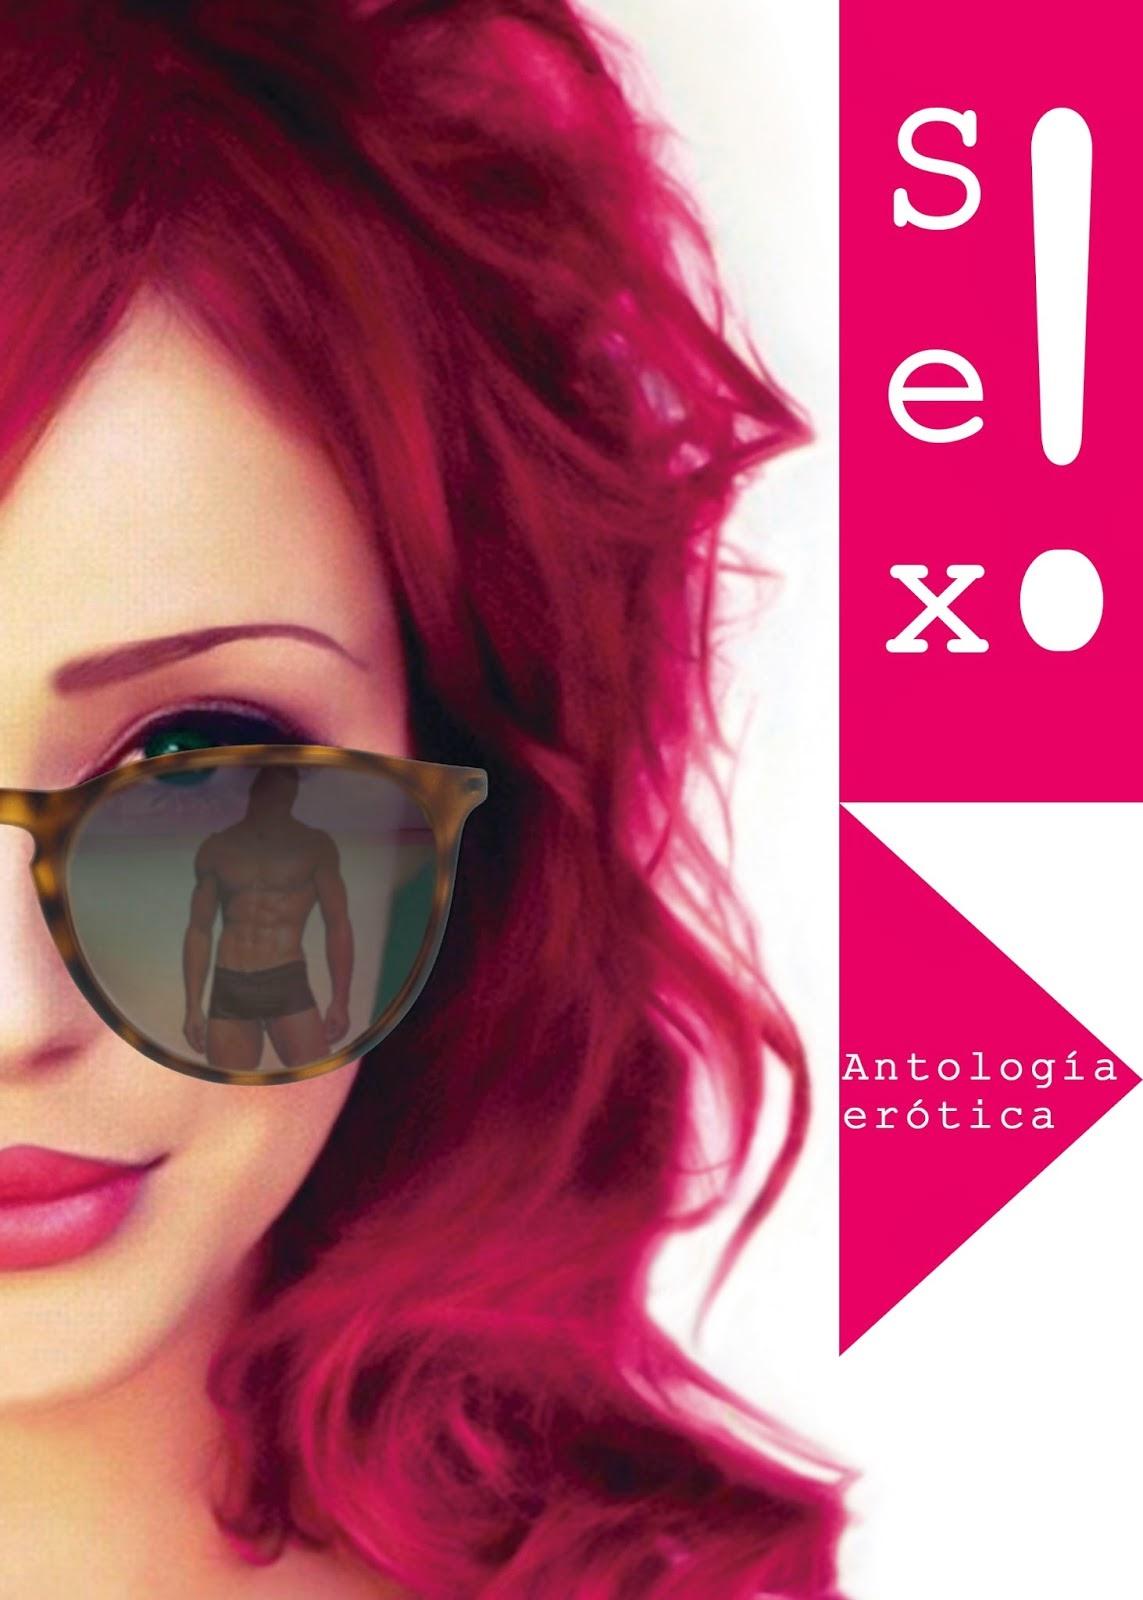 http://unaroma23.blogspot.com.es/2014/07/sex-antologia-erotica-gratuita.html